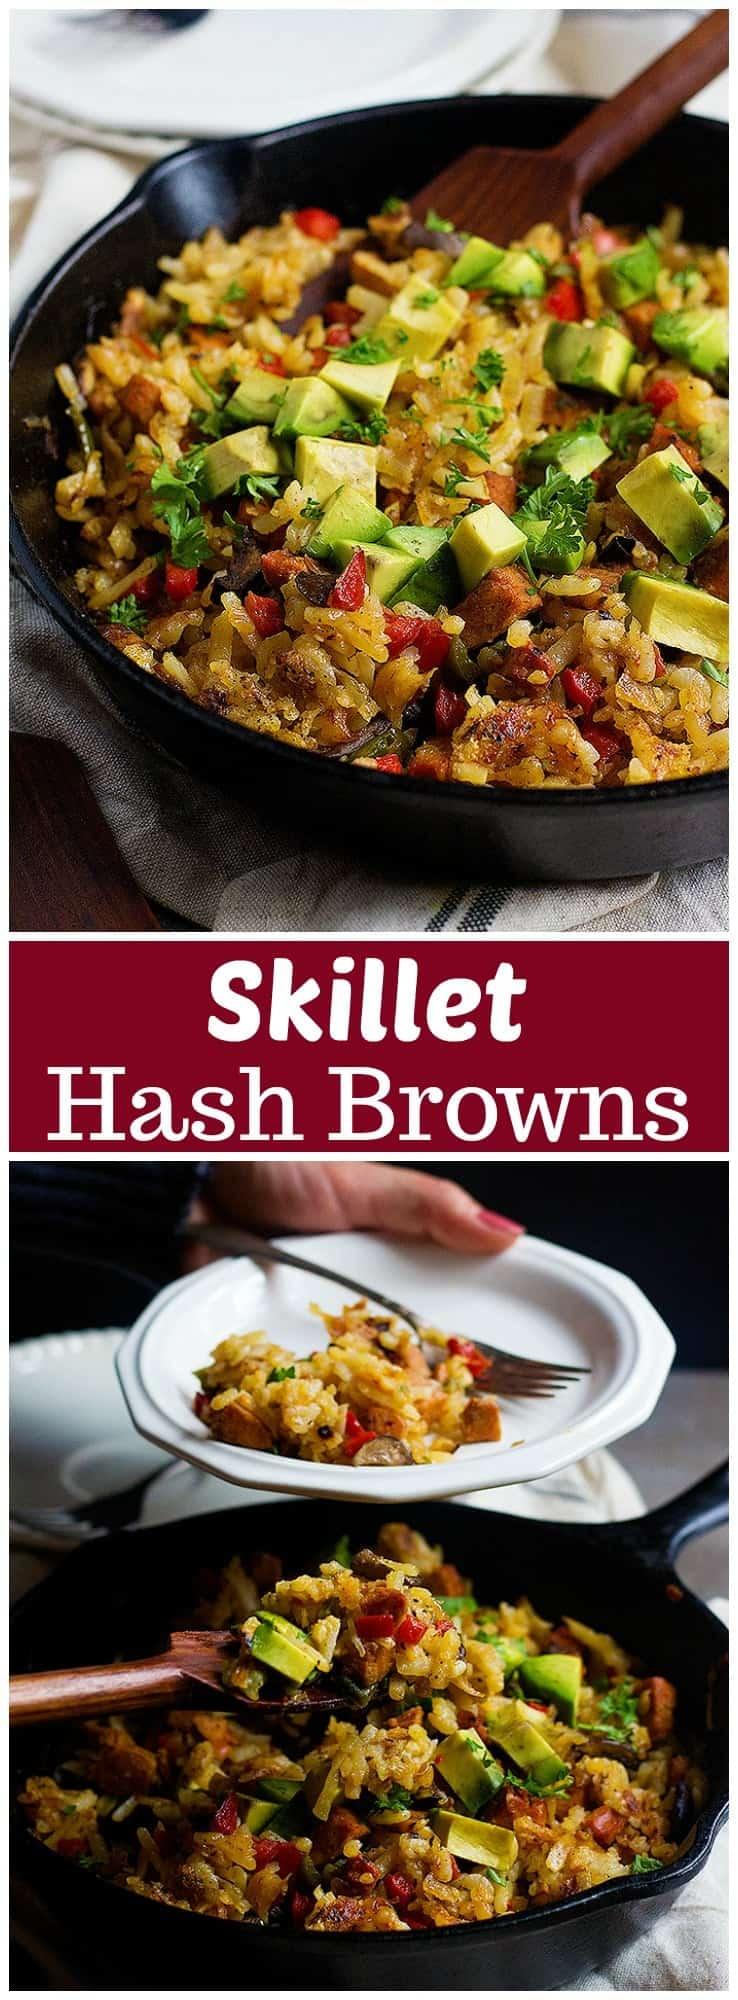 Skillet Hash Browns | Skillet Hash Browns Recipe | Skillet Hash Browns Breakfast | Hash Browns and Sausage | #HashBrowns #HashBrownsBreakfast